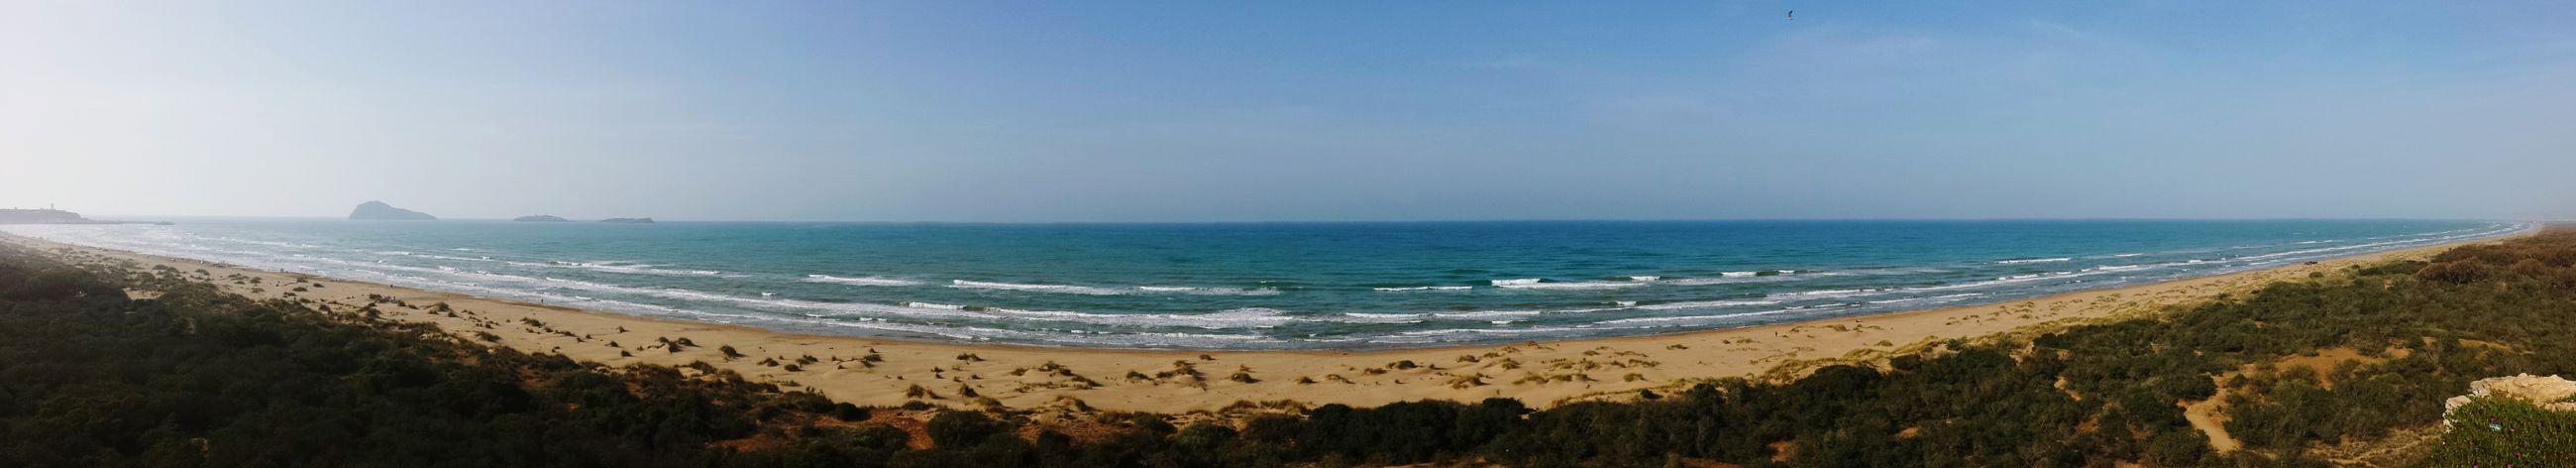 قمقوم الباز Cap De L Eau, Morocco Morocco, Saidia Oujda Morocco Beach Panoramic Nature Beauty Great Morocco سبحانك ربي a magic view, i definitely love this place